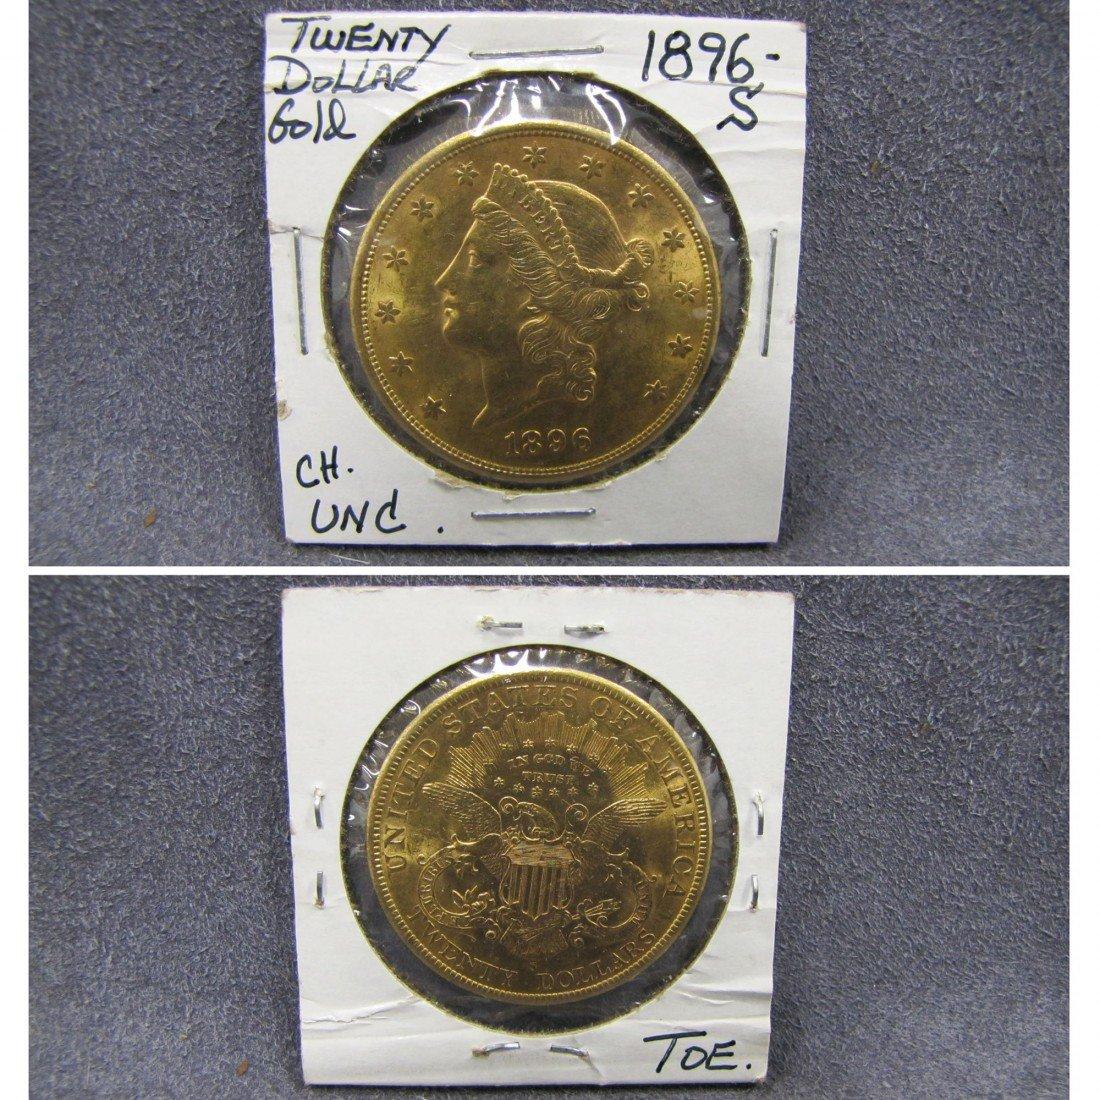 117: US 1896S TWENTY DOLLAR LIBERTY GOLD (UNC)